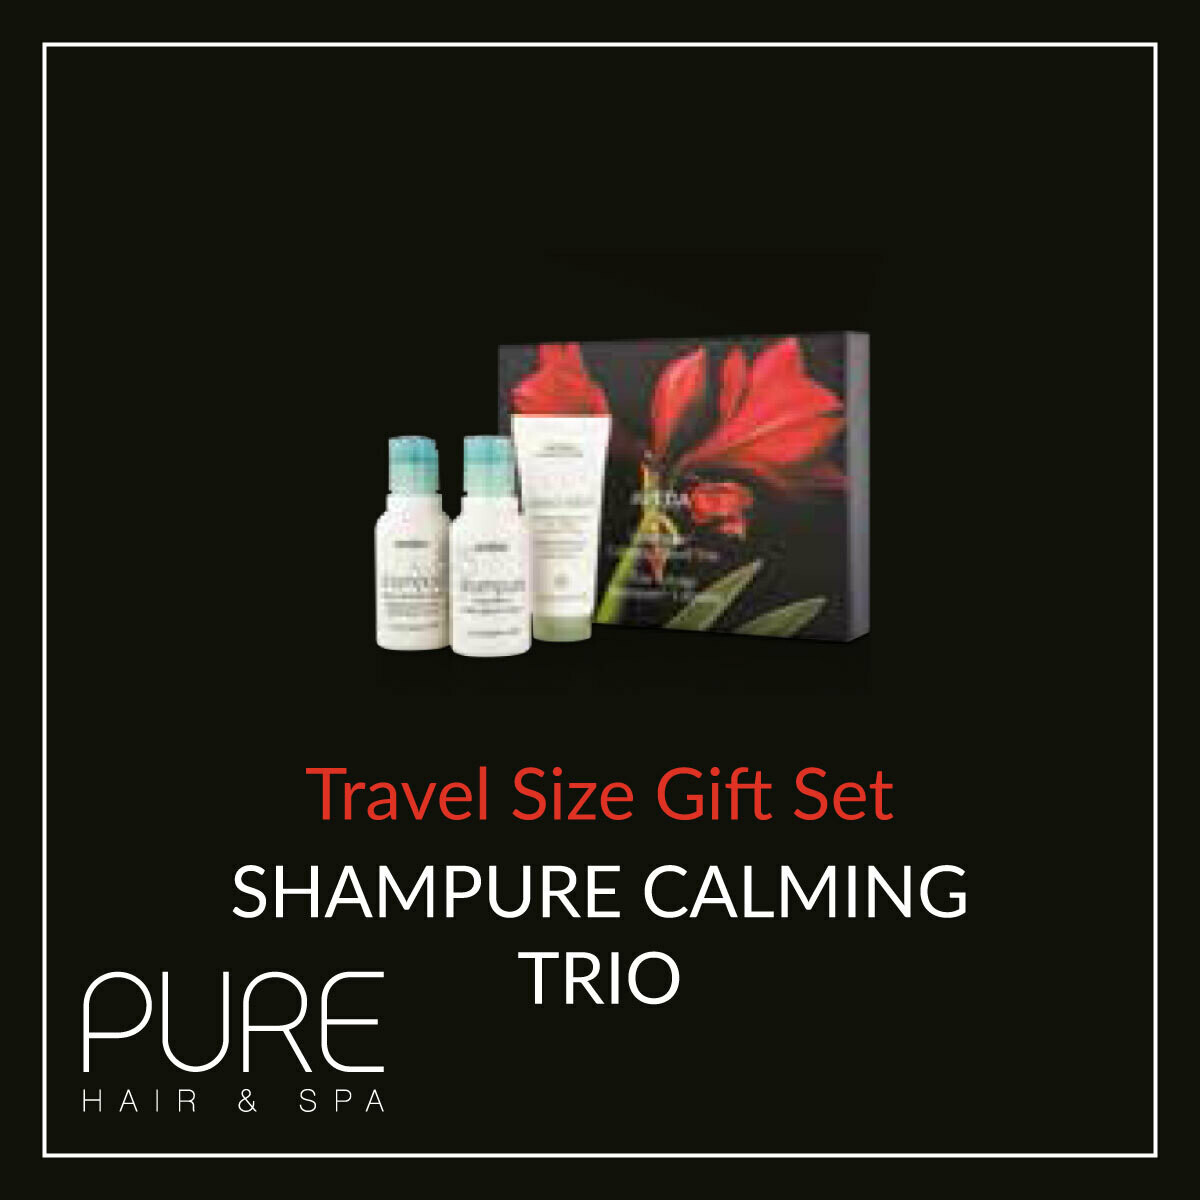 Aveda Calming Travel Trio Gift Set.